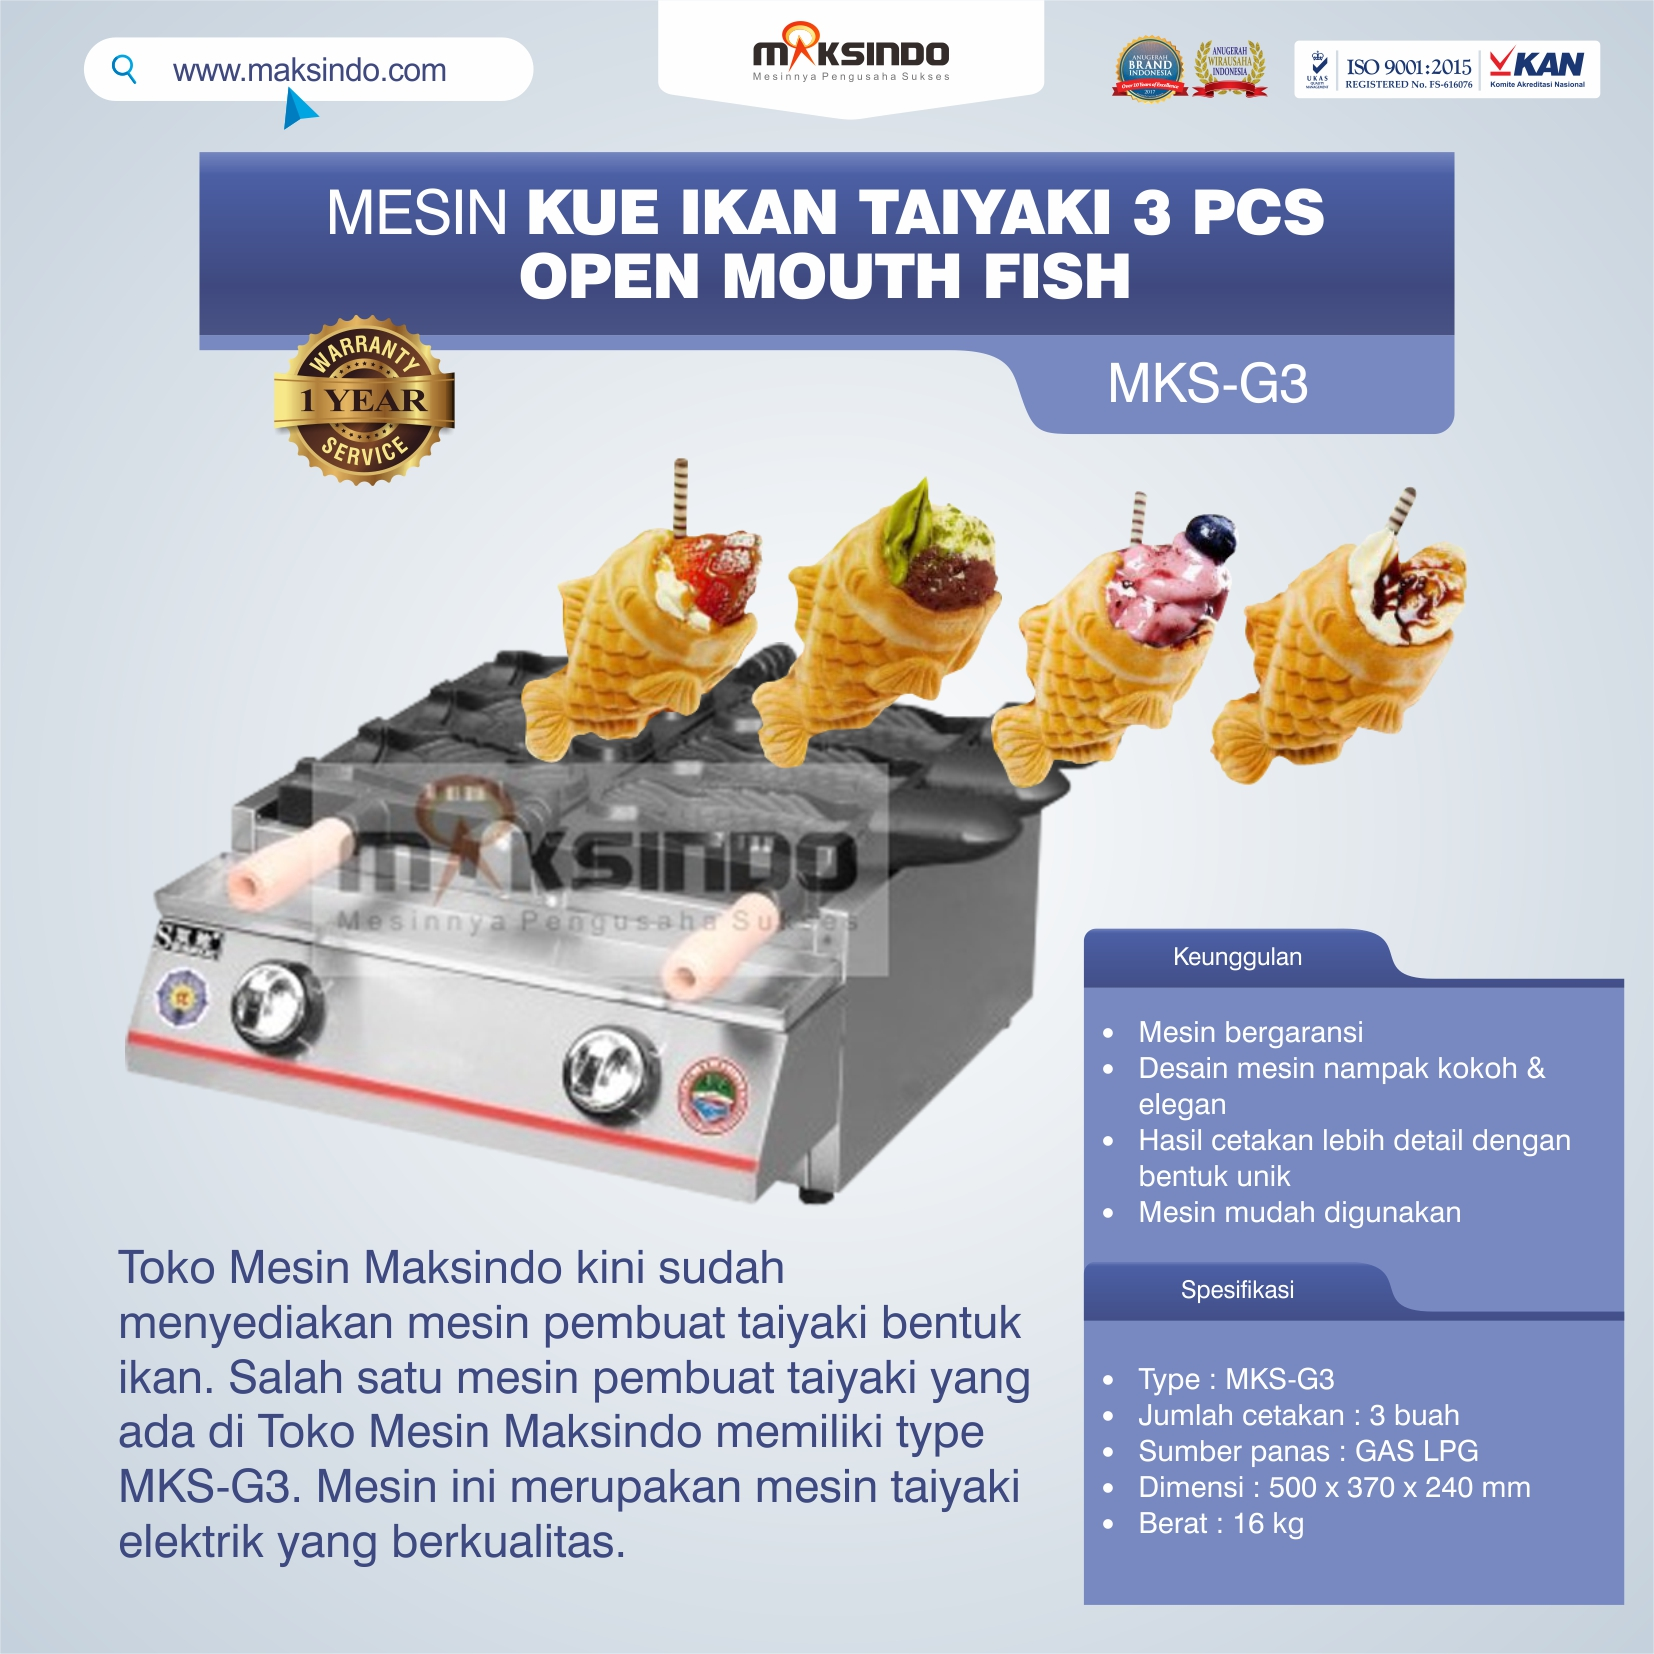 Jual Mesin Kue Ikan Taiyaki (3 pcs) – Open Mouth Fish di Bekasi